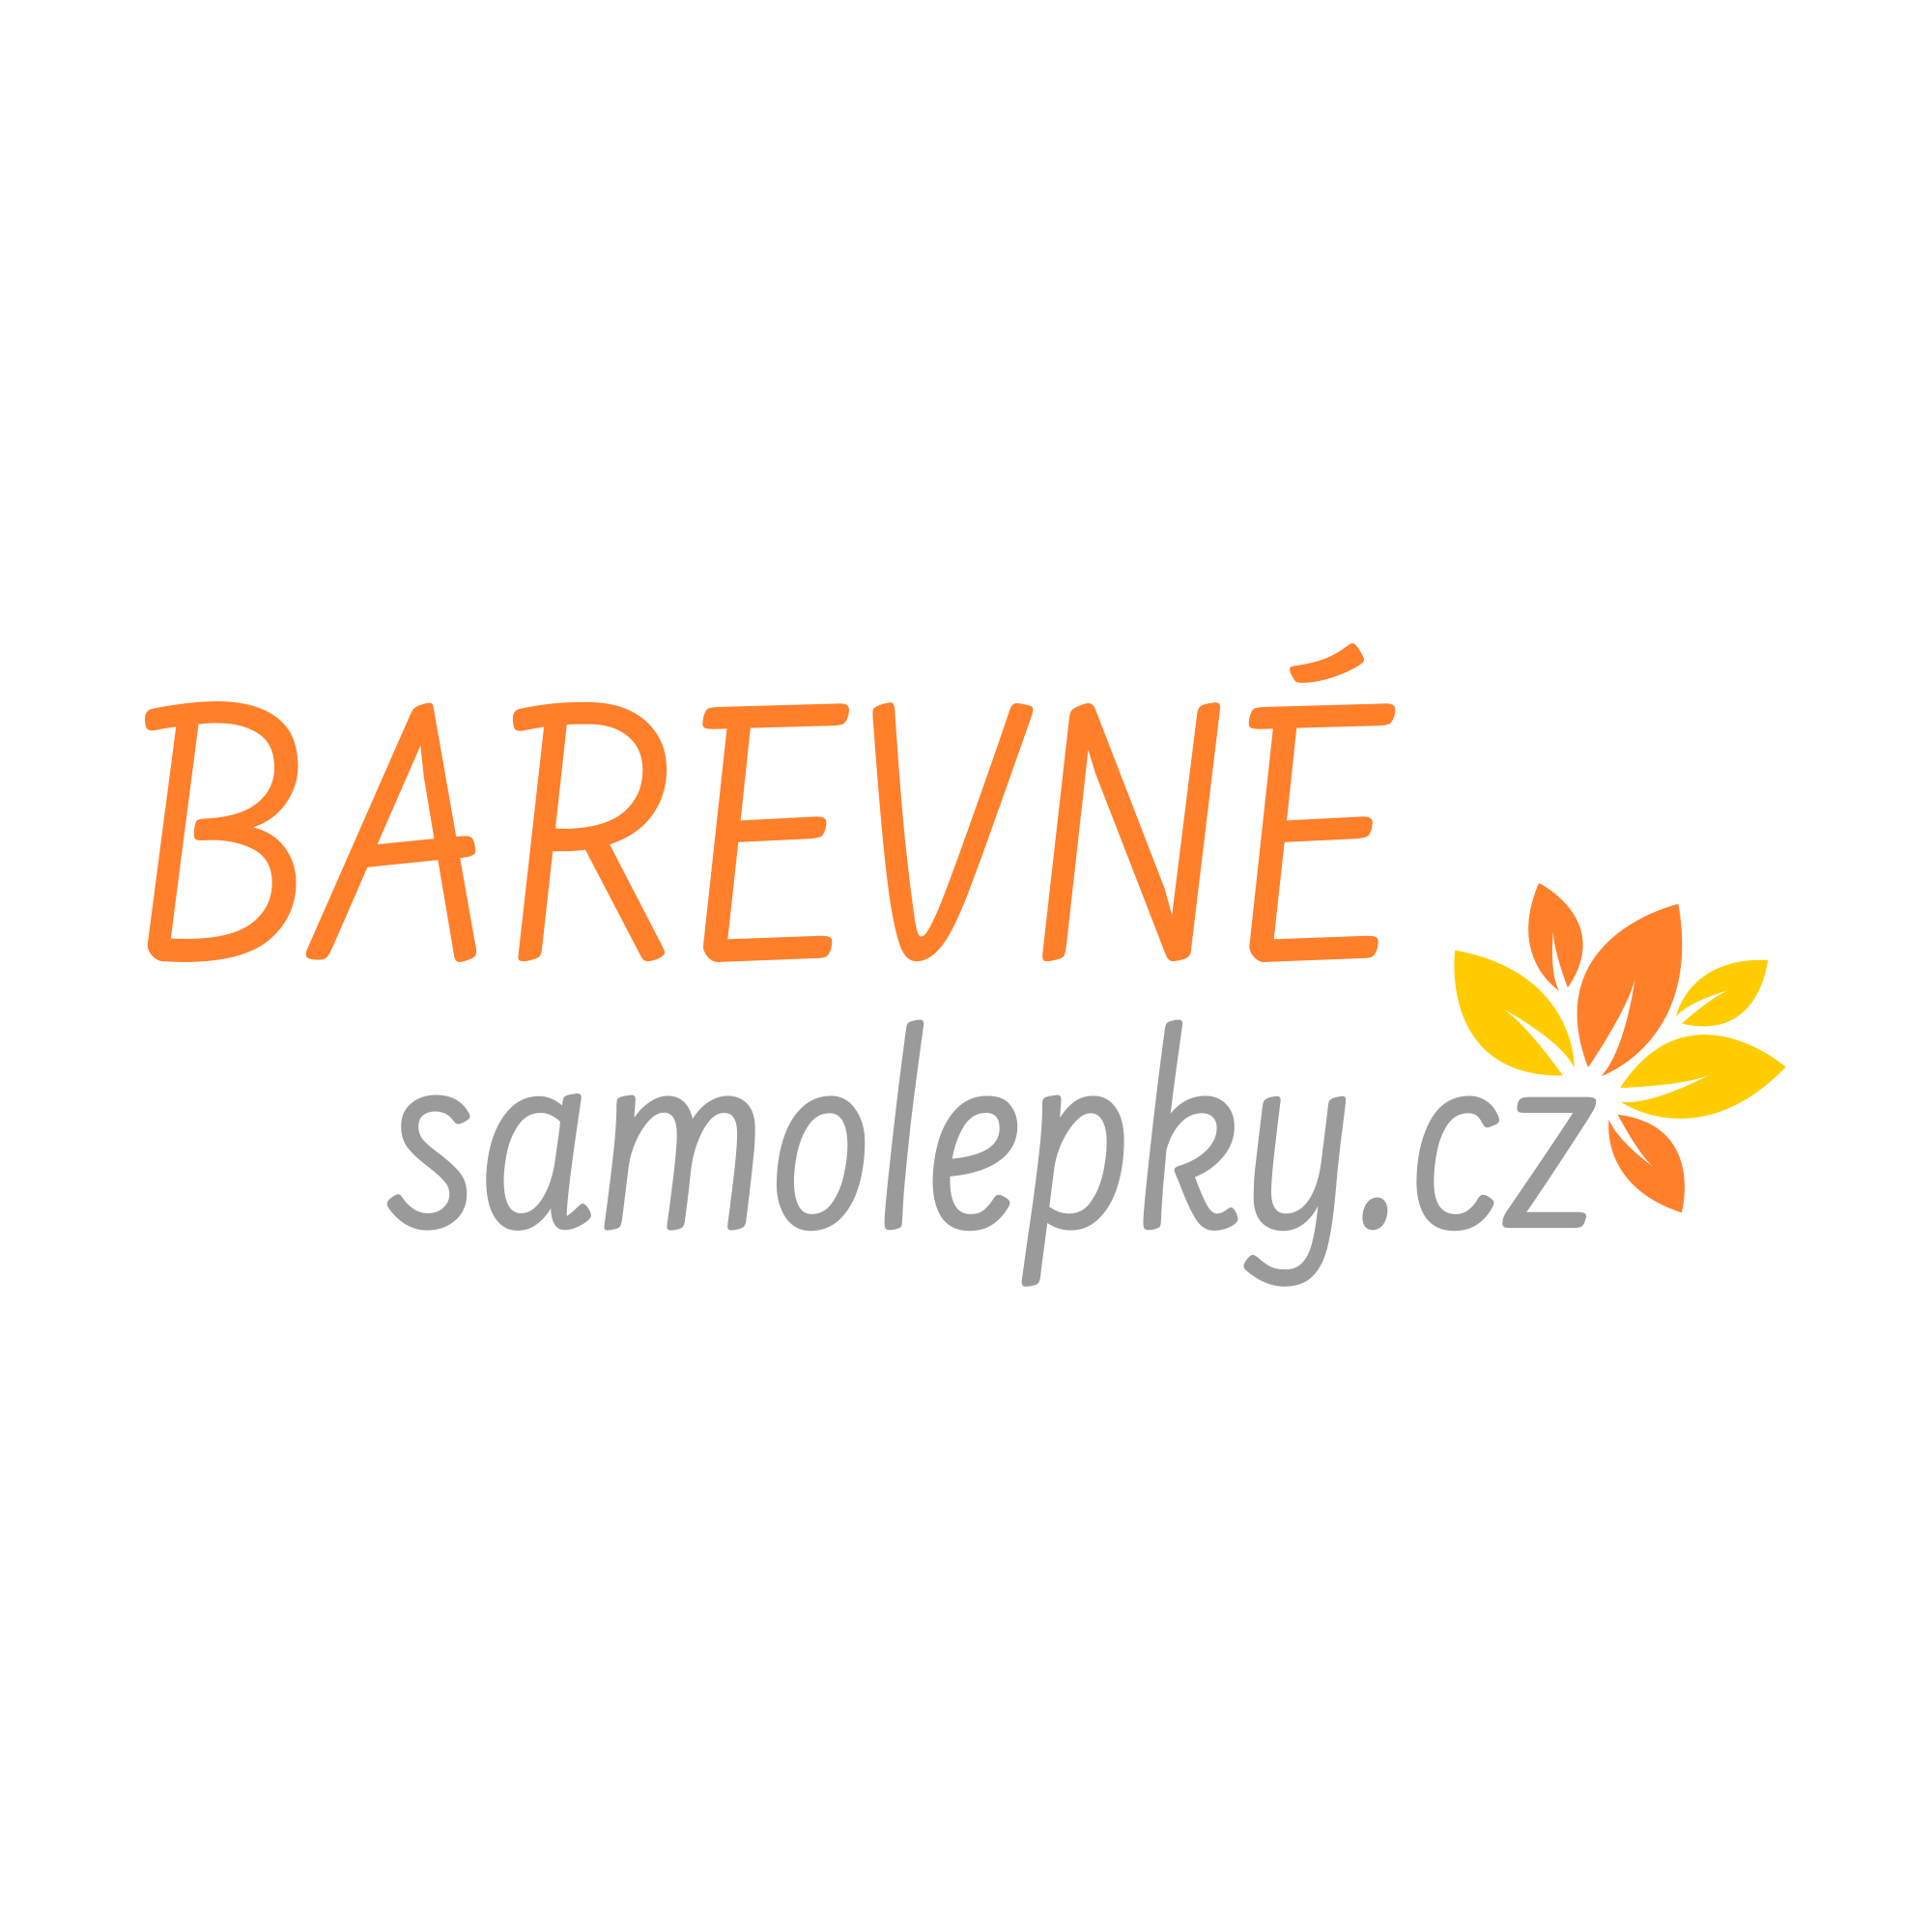 BAREVNÉ samolepky.cz